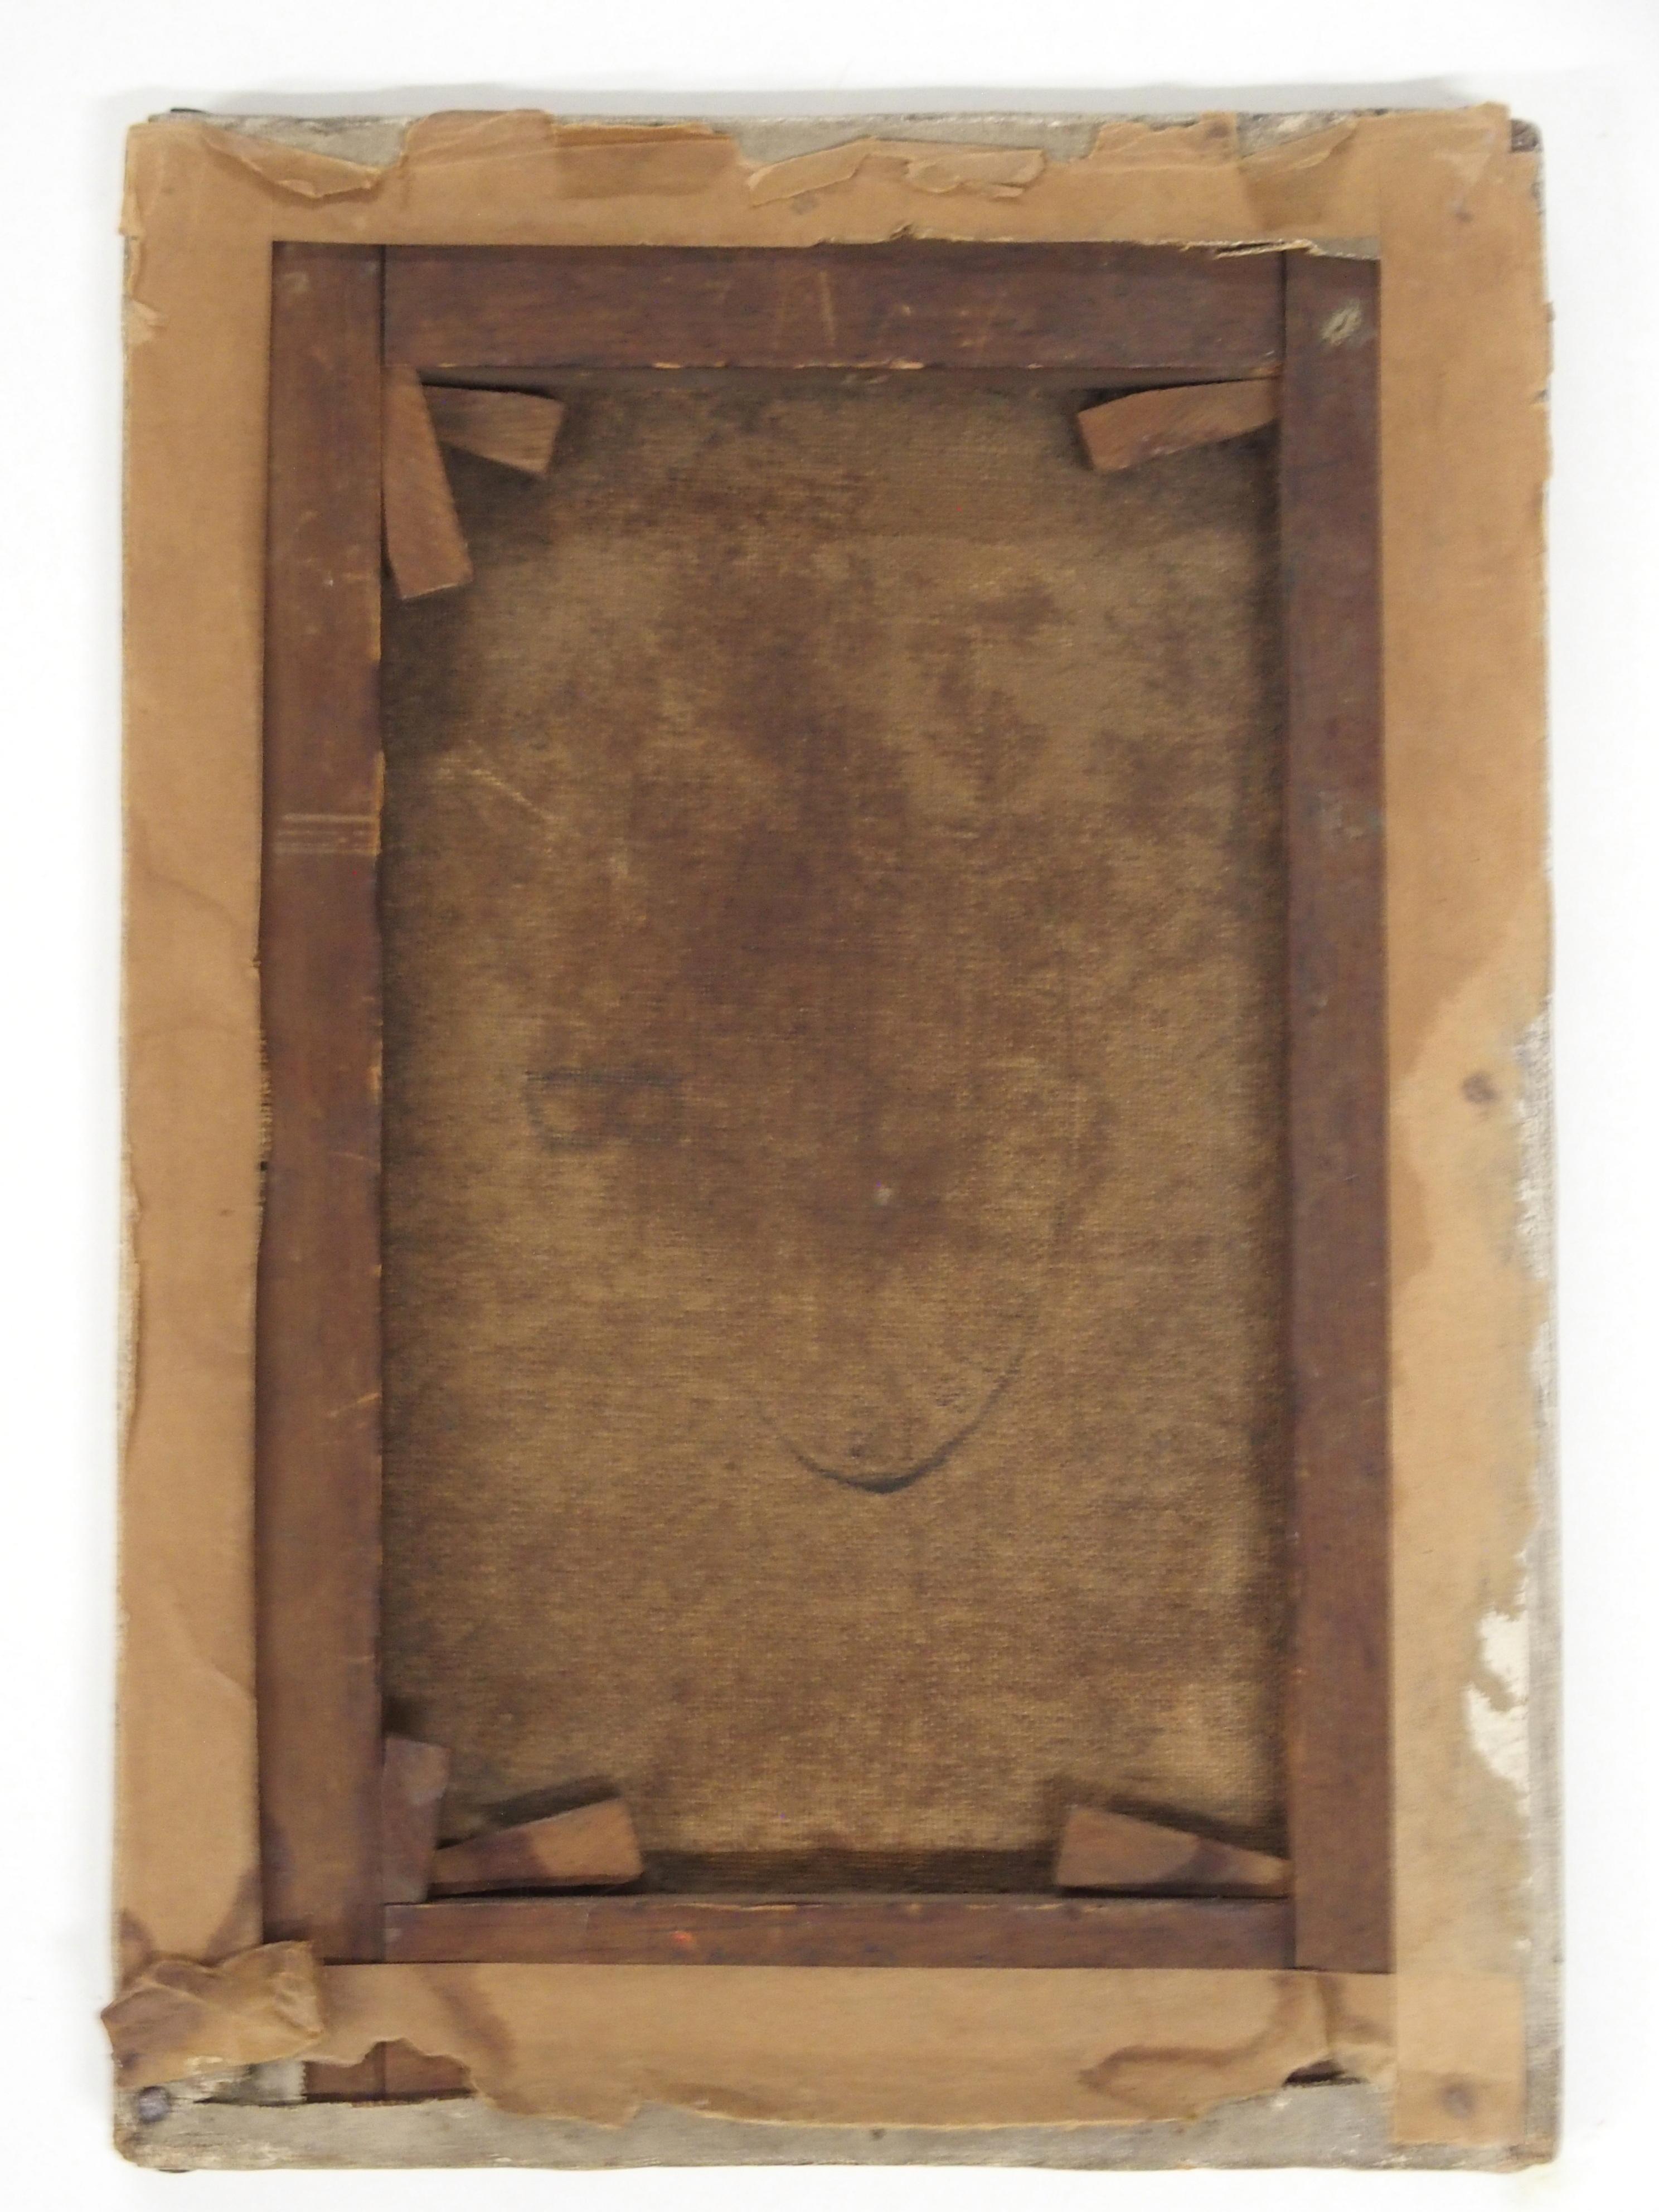 •DONALD BAIN (SCOTTISH 1904-1979) CHILD PORTRAIT oil on canvas, signed, 26 x 18cm Condition - Image 3 of 3